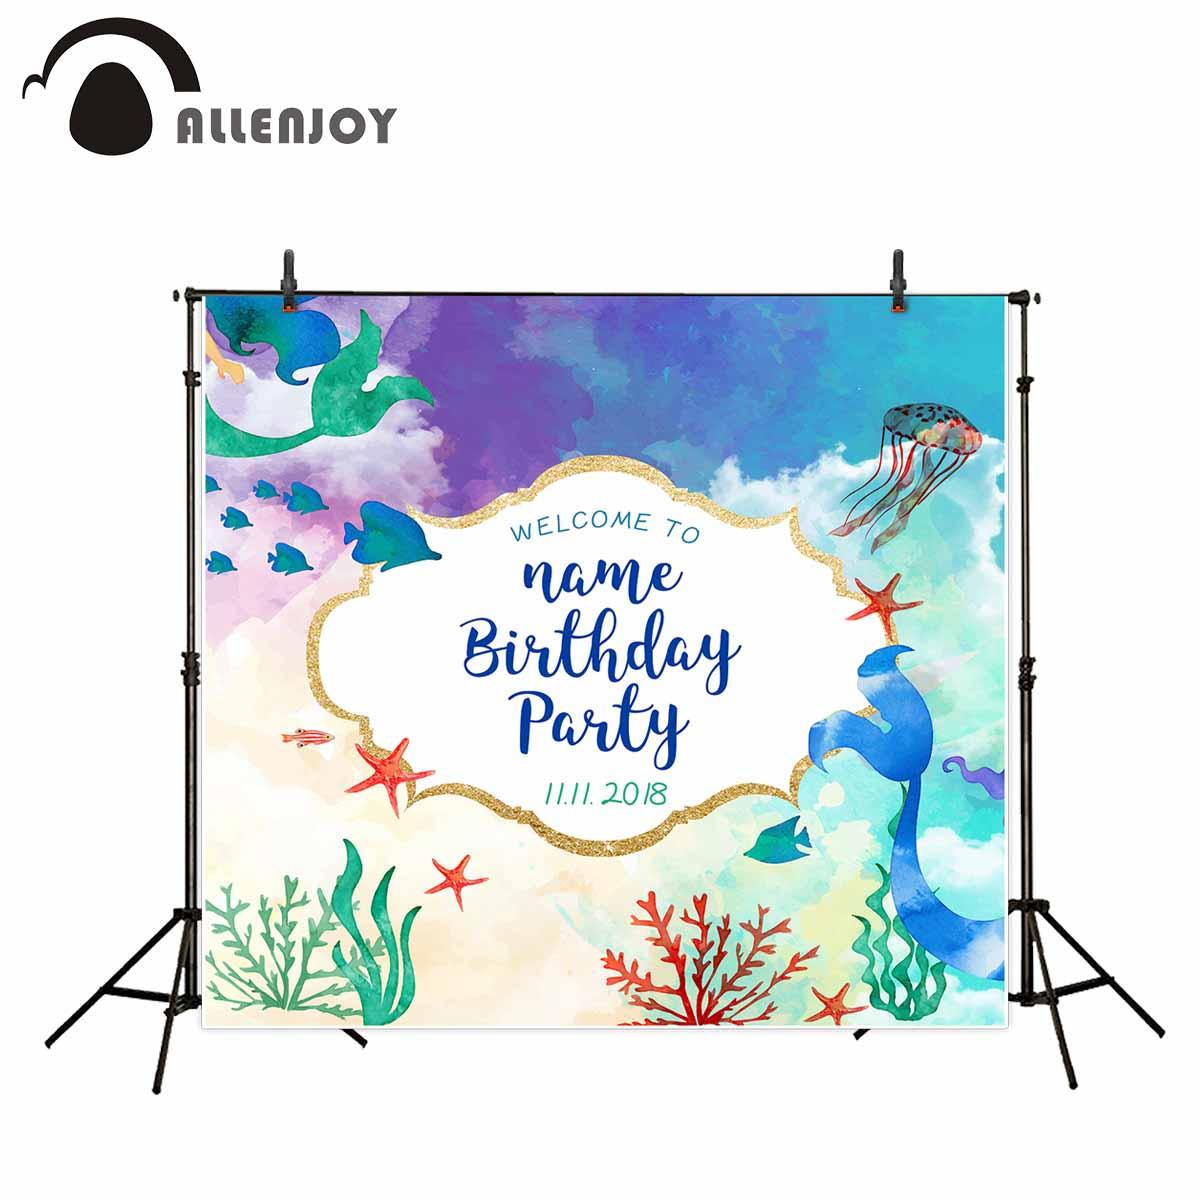 Allenjoy mermaid photo background wonderland children birthday party background sea theme background jellyfish photocall